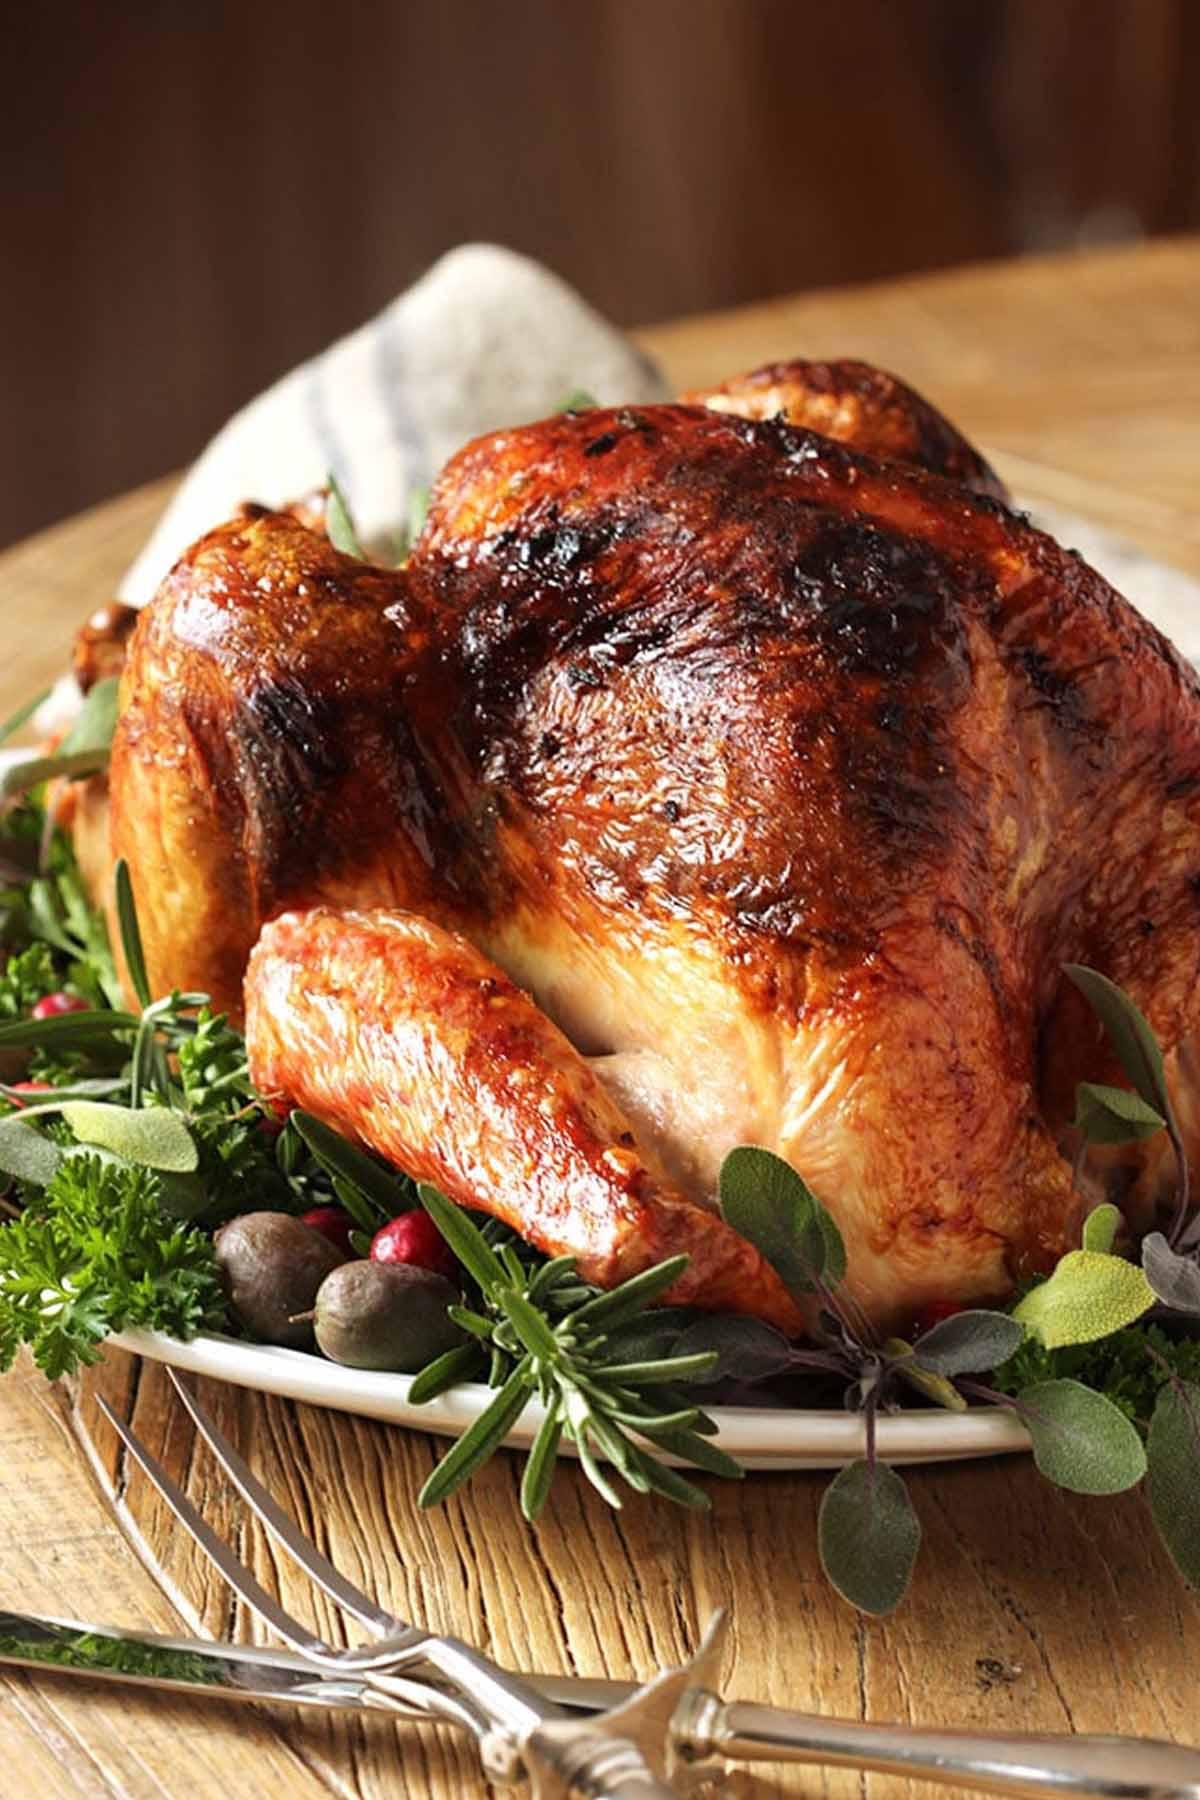 Turkey Pictures For Thanksgiving  19 Best Thanksgiving Turkey Recipes Easy Roast Turkey